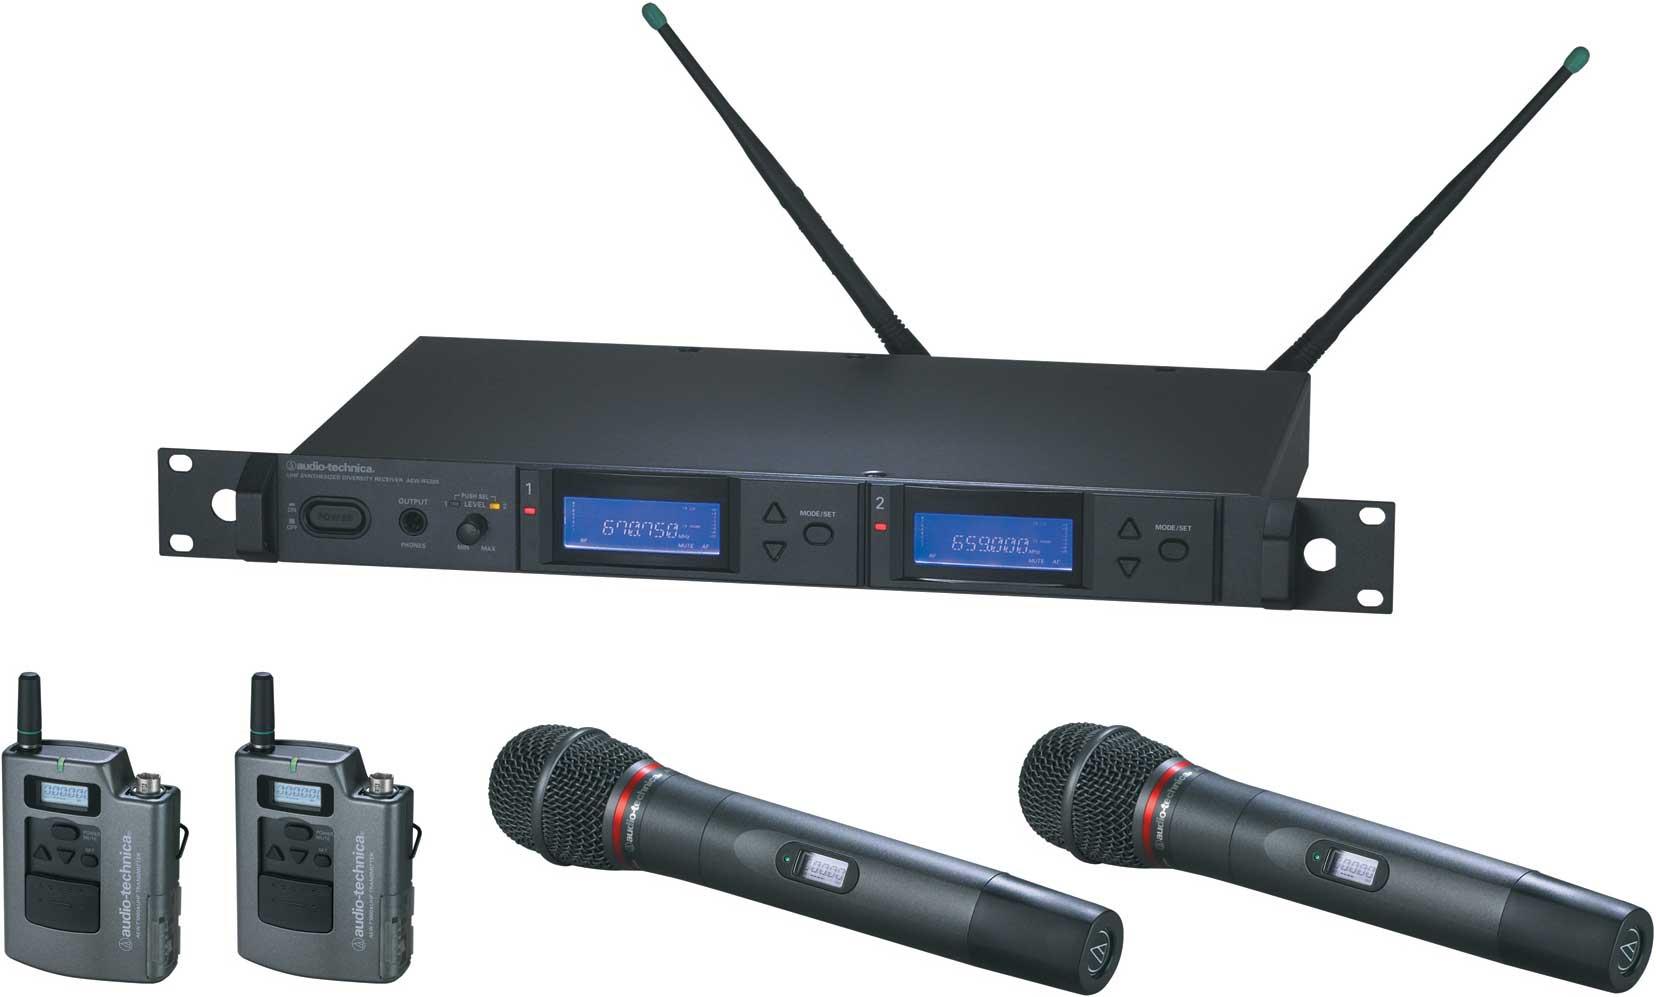 Audio-Technica AEW-5416AC Wireless Mic Microphone System with 2 x Bodypack Transmitters & 2 x AEW-T6100a Hypercardioid Dynamic Mic/Transmitter, UHF Band C: 541.500 MHz to 566.375 MHz AEW-5416AC